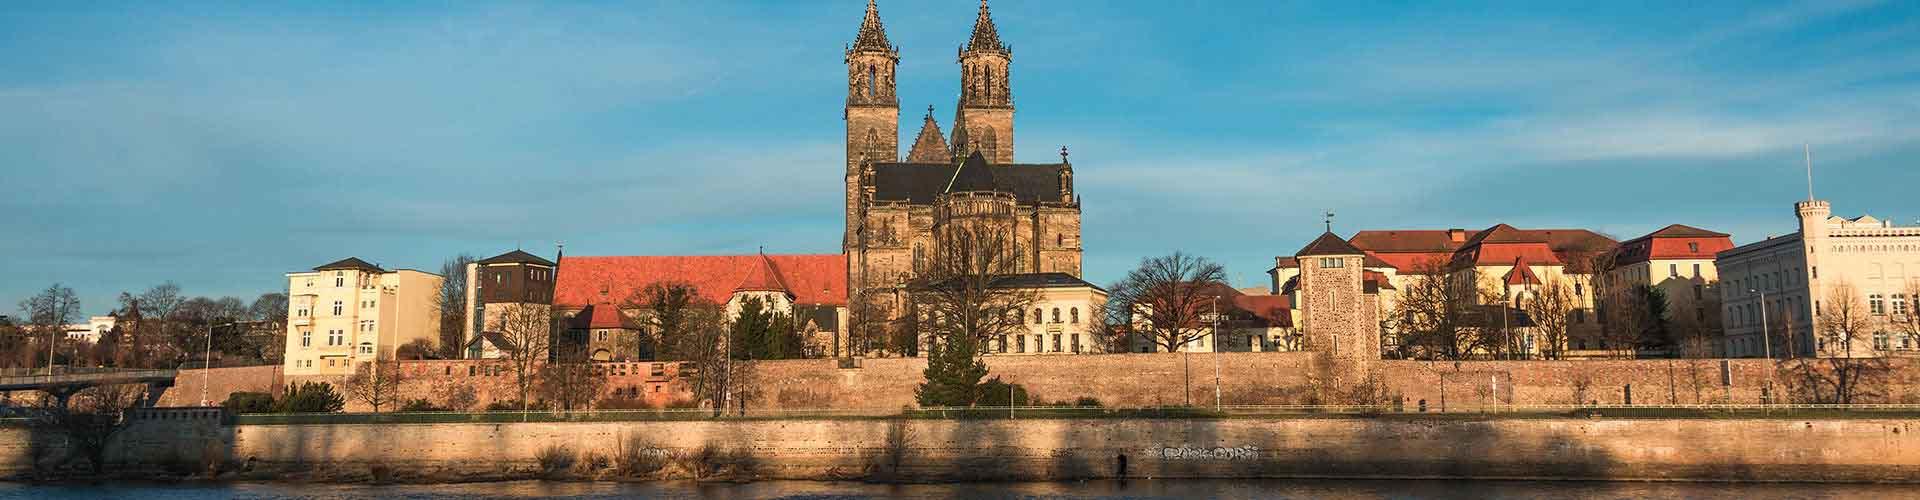 Magdeburgo - Campamentos en Magdeburgo. Mapas de Magdeburgo, Fotos y Comentarios para cada campamento en Magdeburgo.